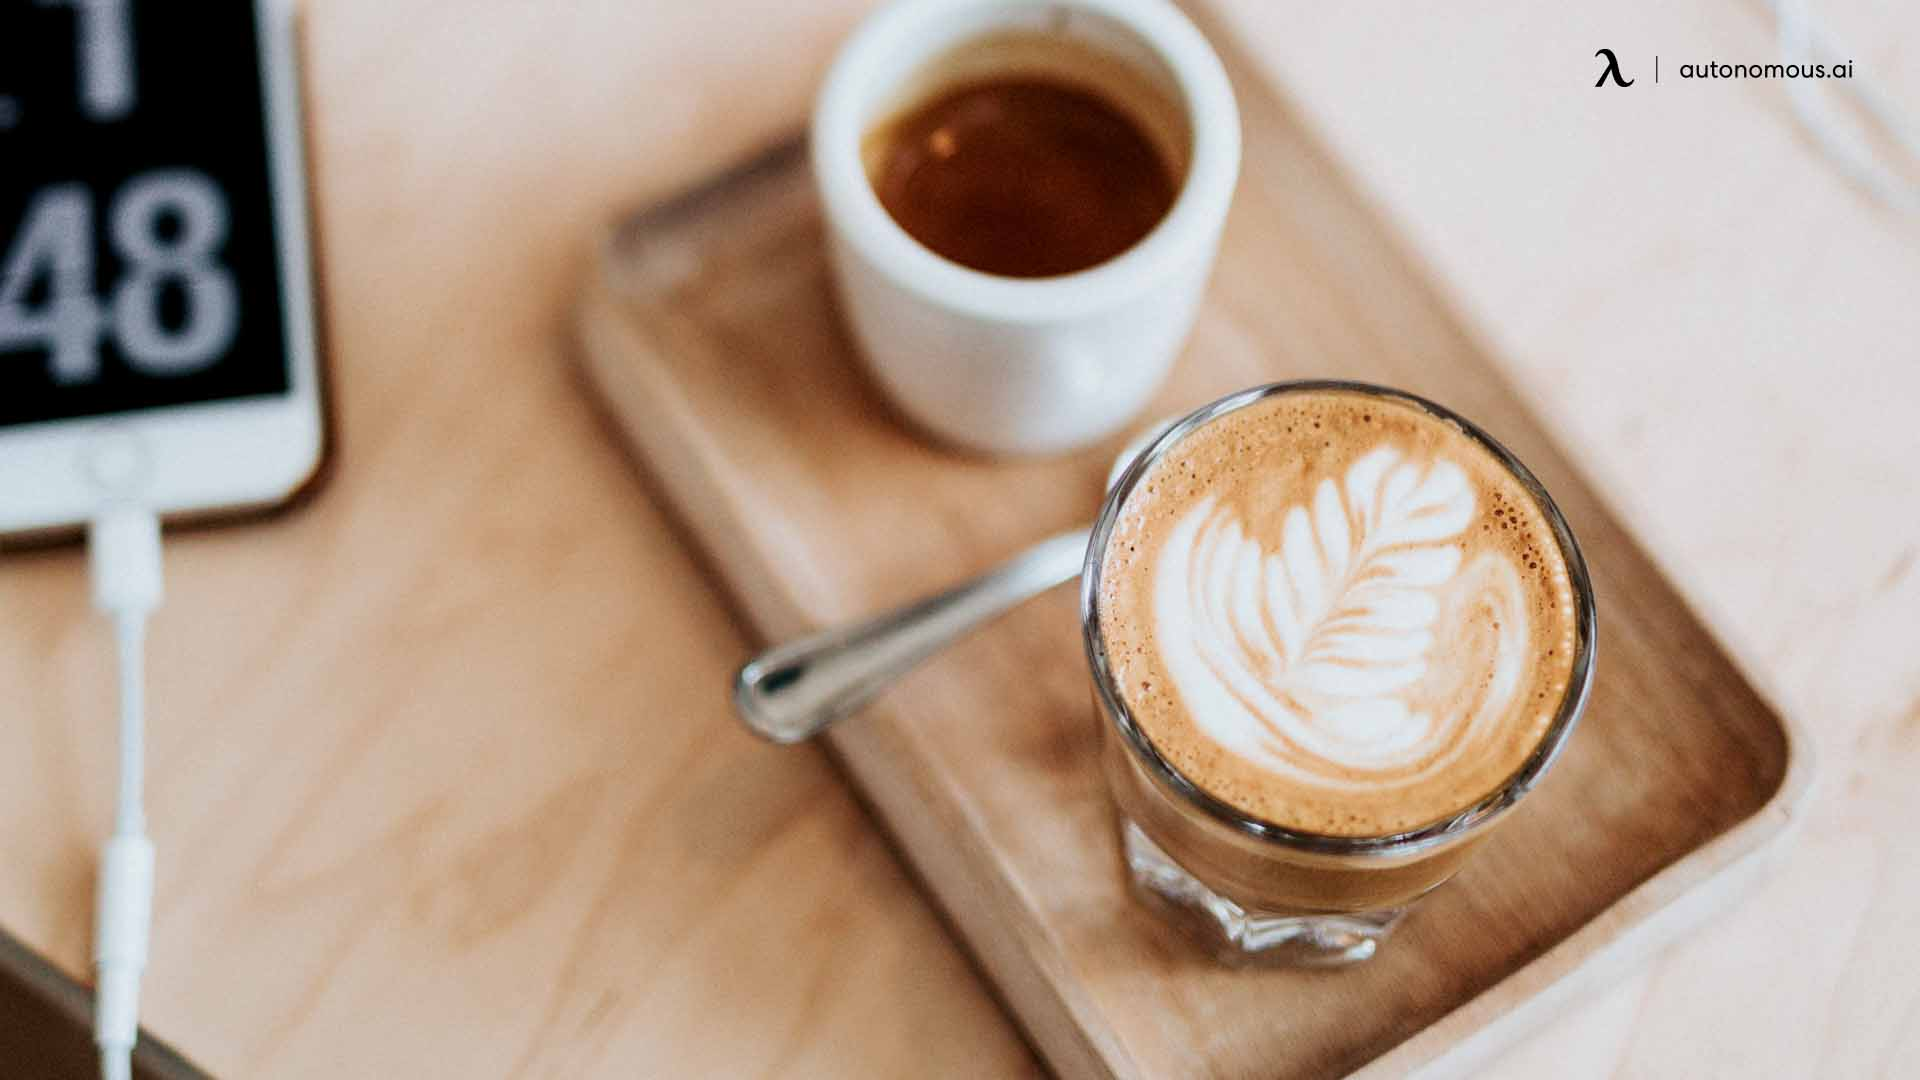 lay off the caffeine